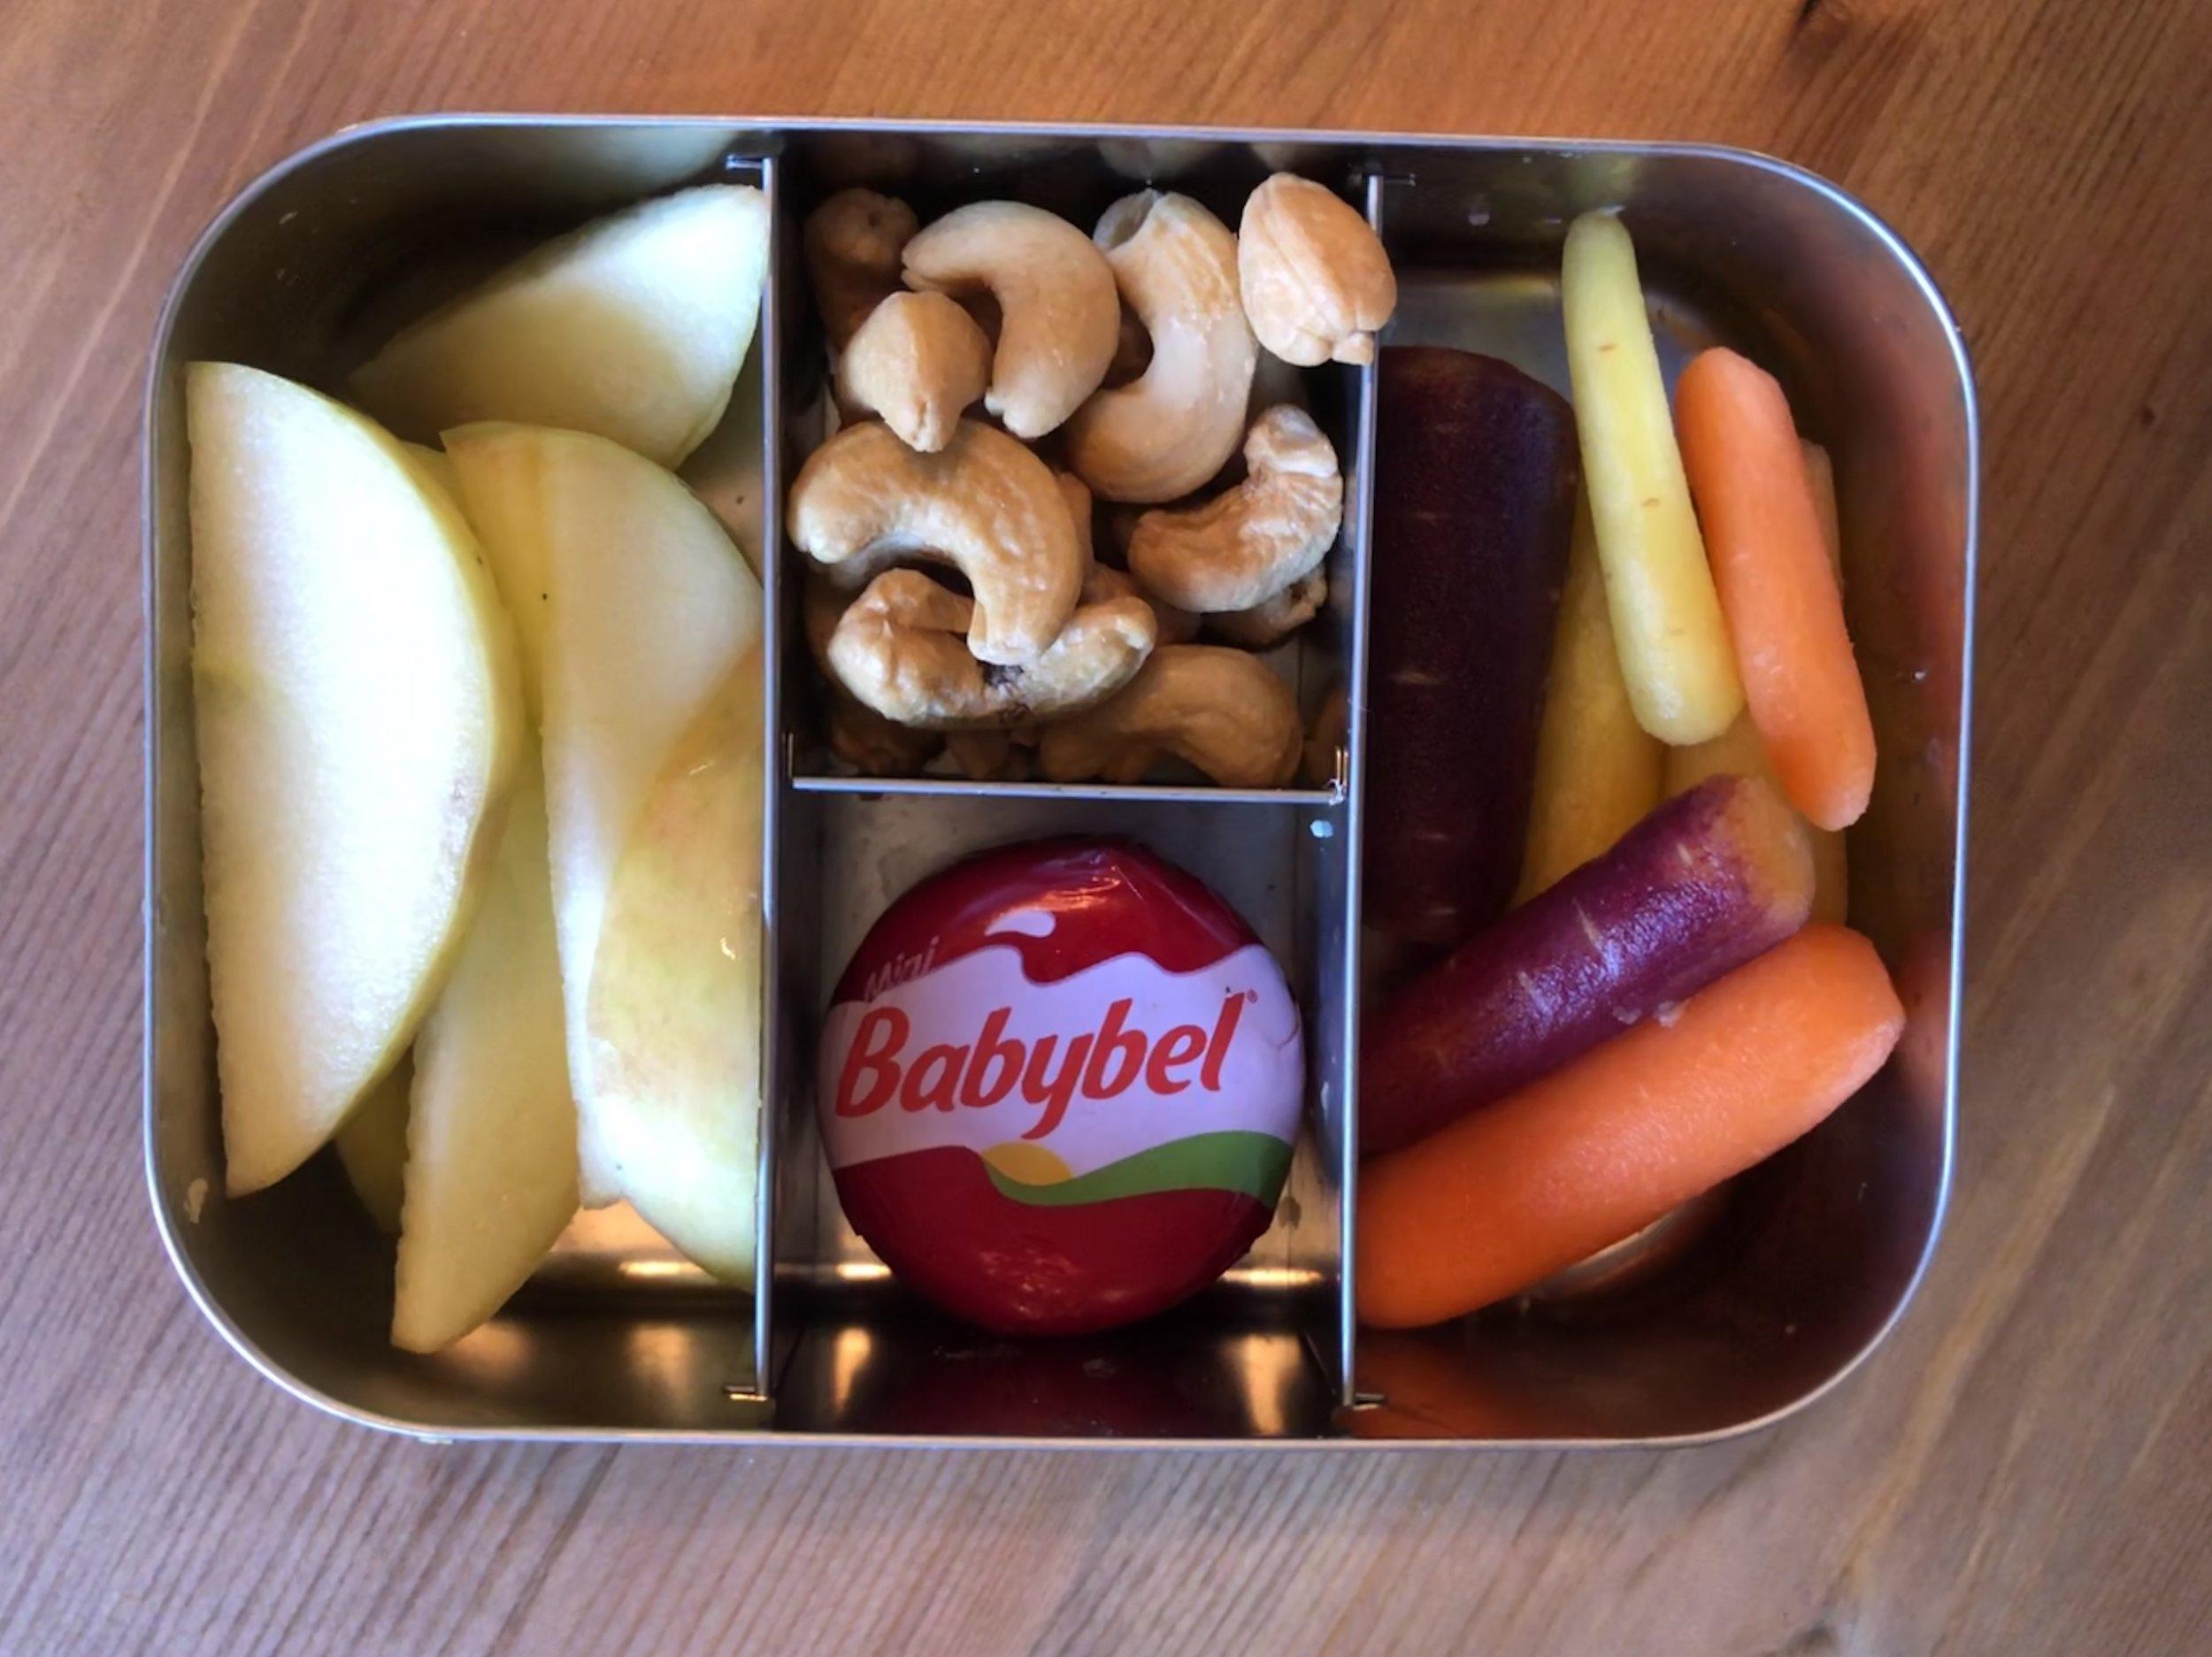 organic apple slices, cashews, babybel cheese, organic rainbow carrots.